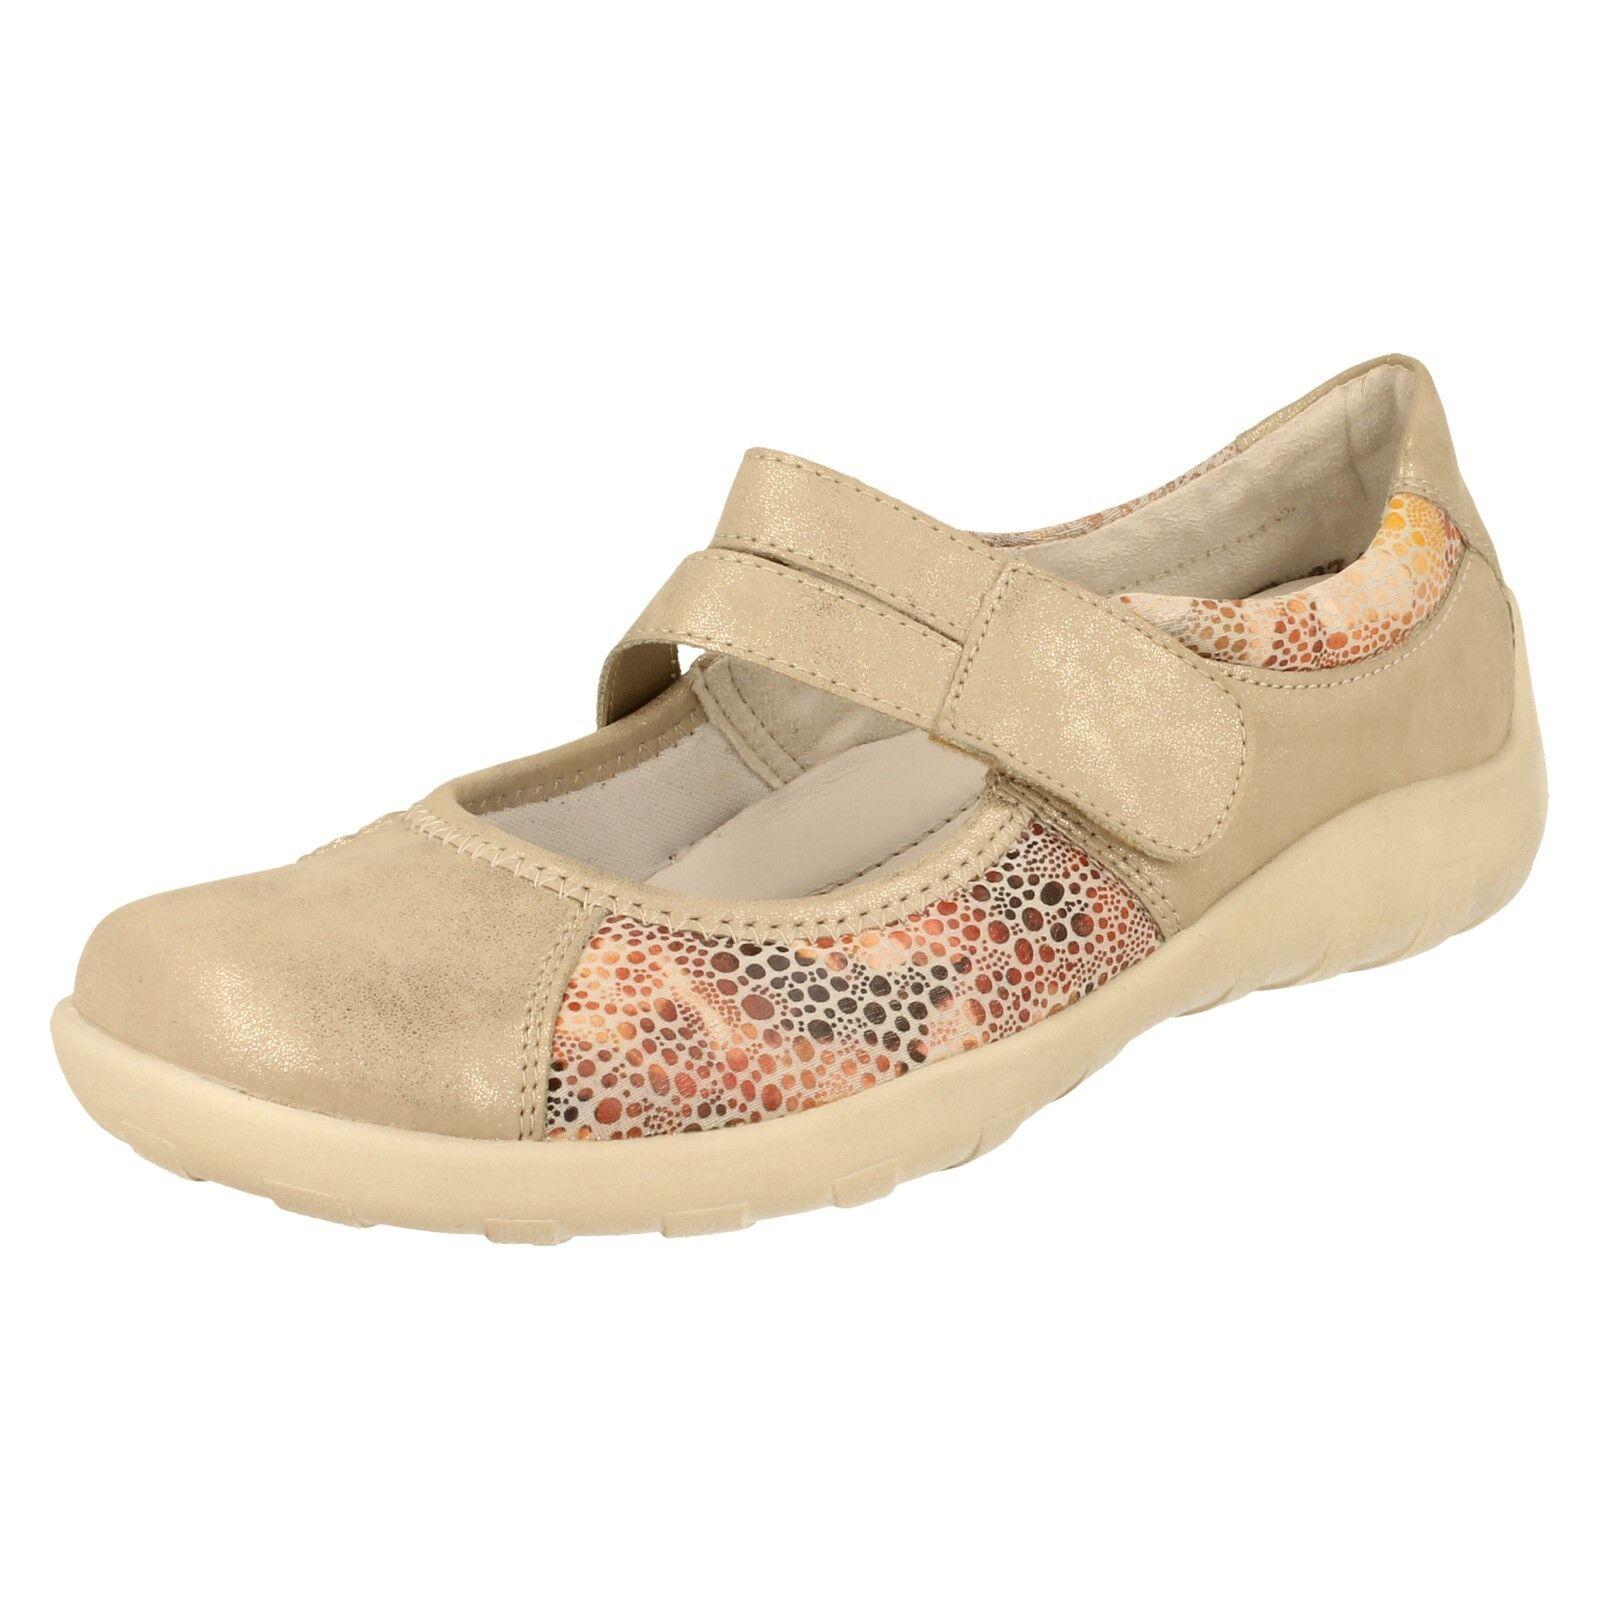 Damenschuhe Remonte Casual Schuhe stile Mary Jane - R3510